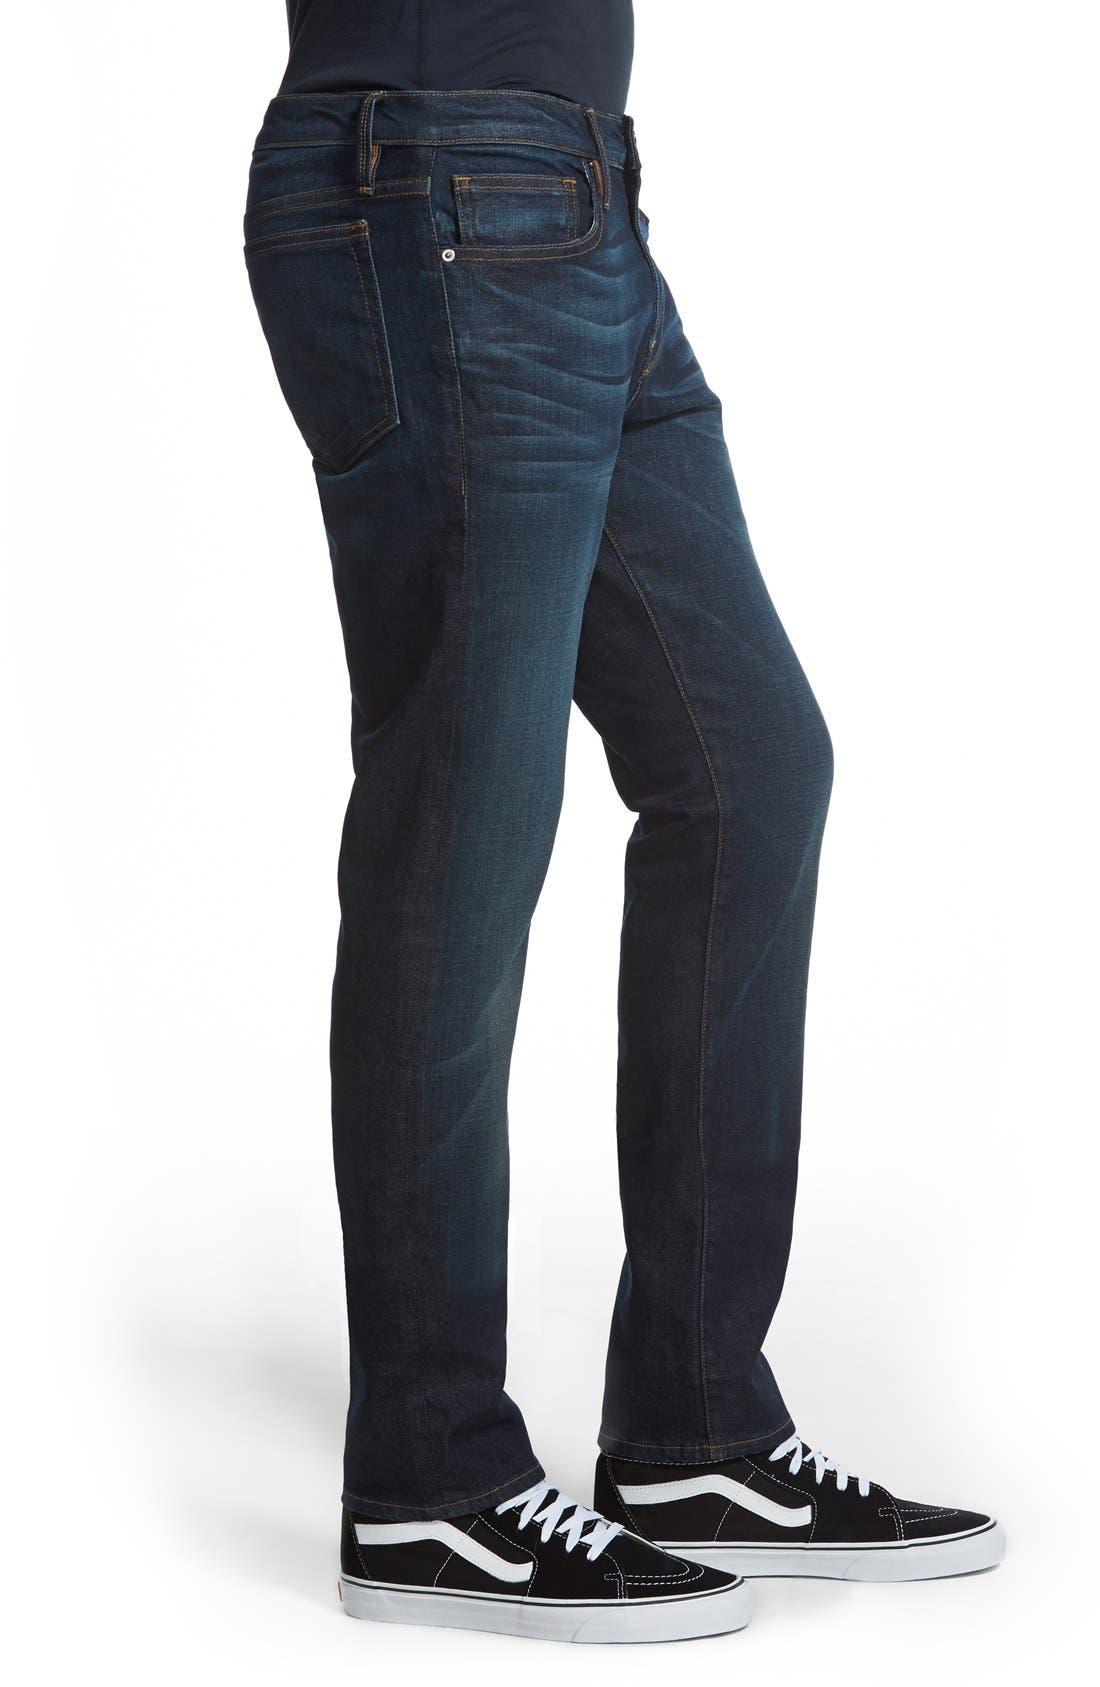 L'Homme Skinny Fit Jeans,                             Alternate thumbnail 3, color,                             Sierra